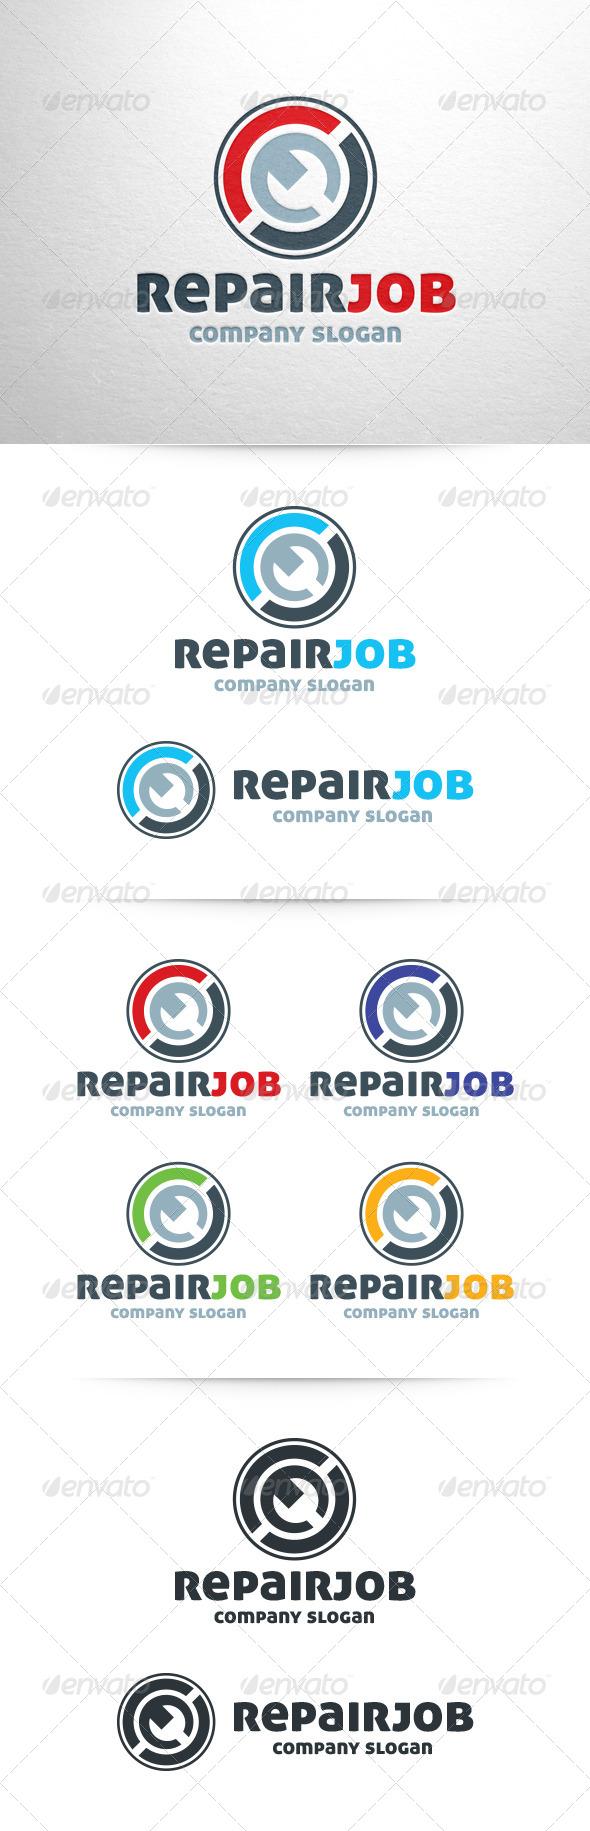 GraphicRiver Repair Job Logo Template 6571276